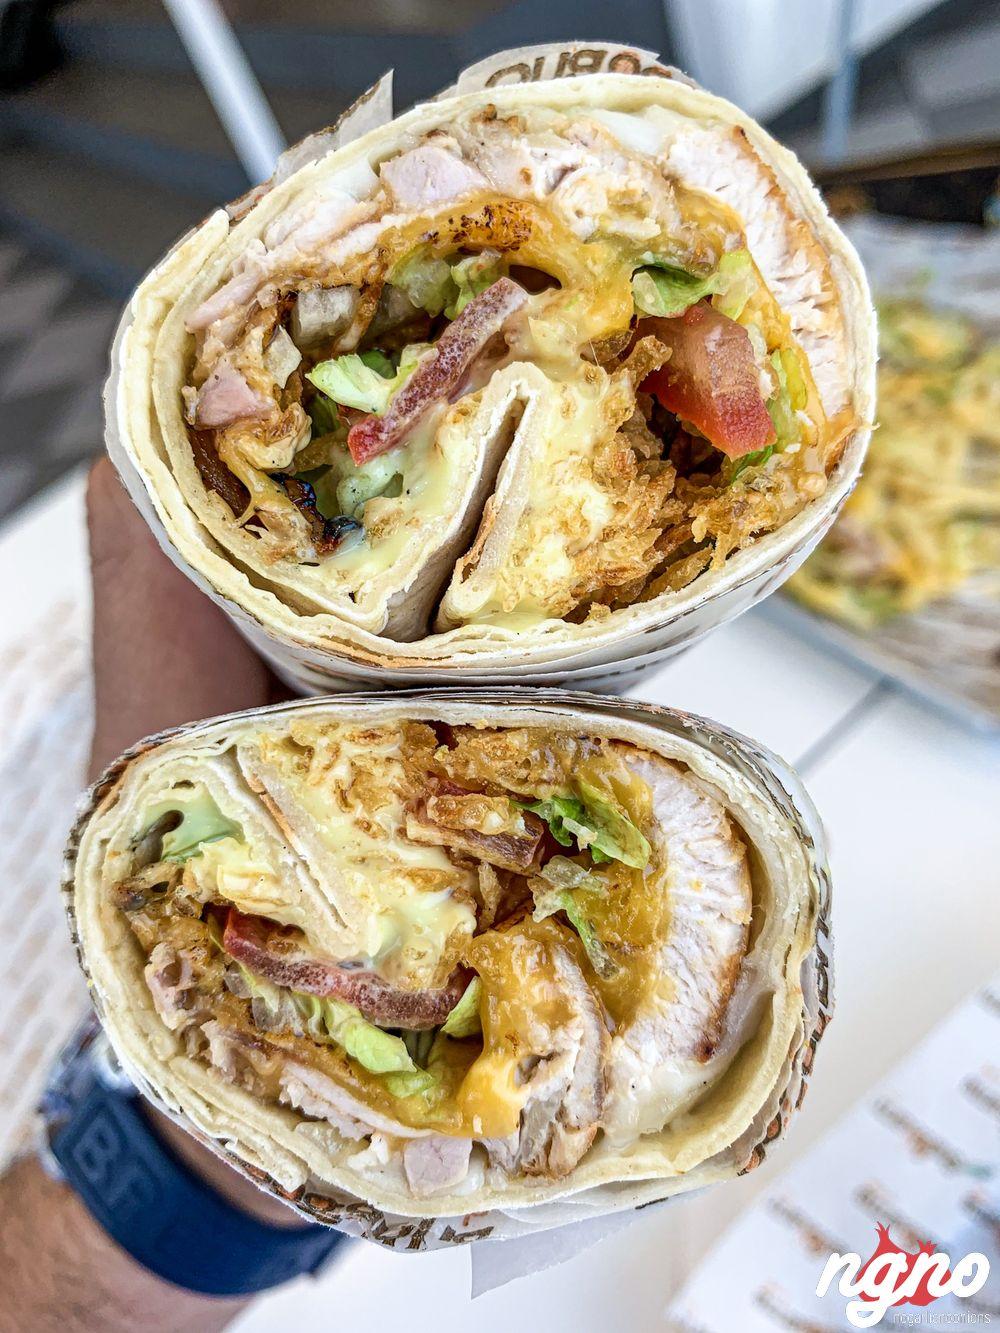 shawarma-lab-street-food-lebanon-nogarlicnoonions-202019-05-15-08-26-40